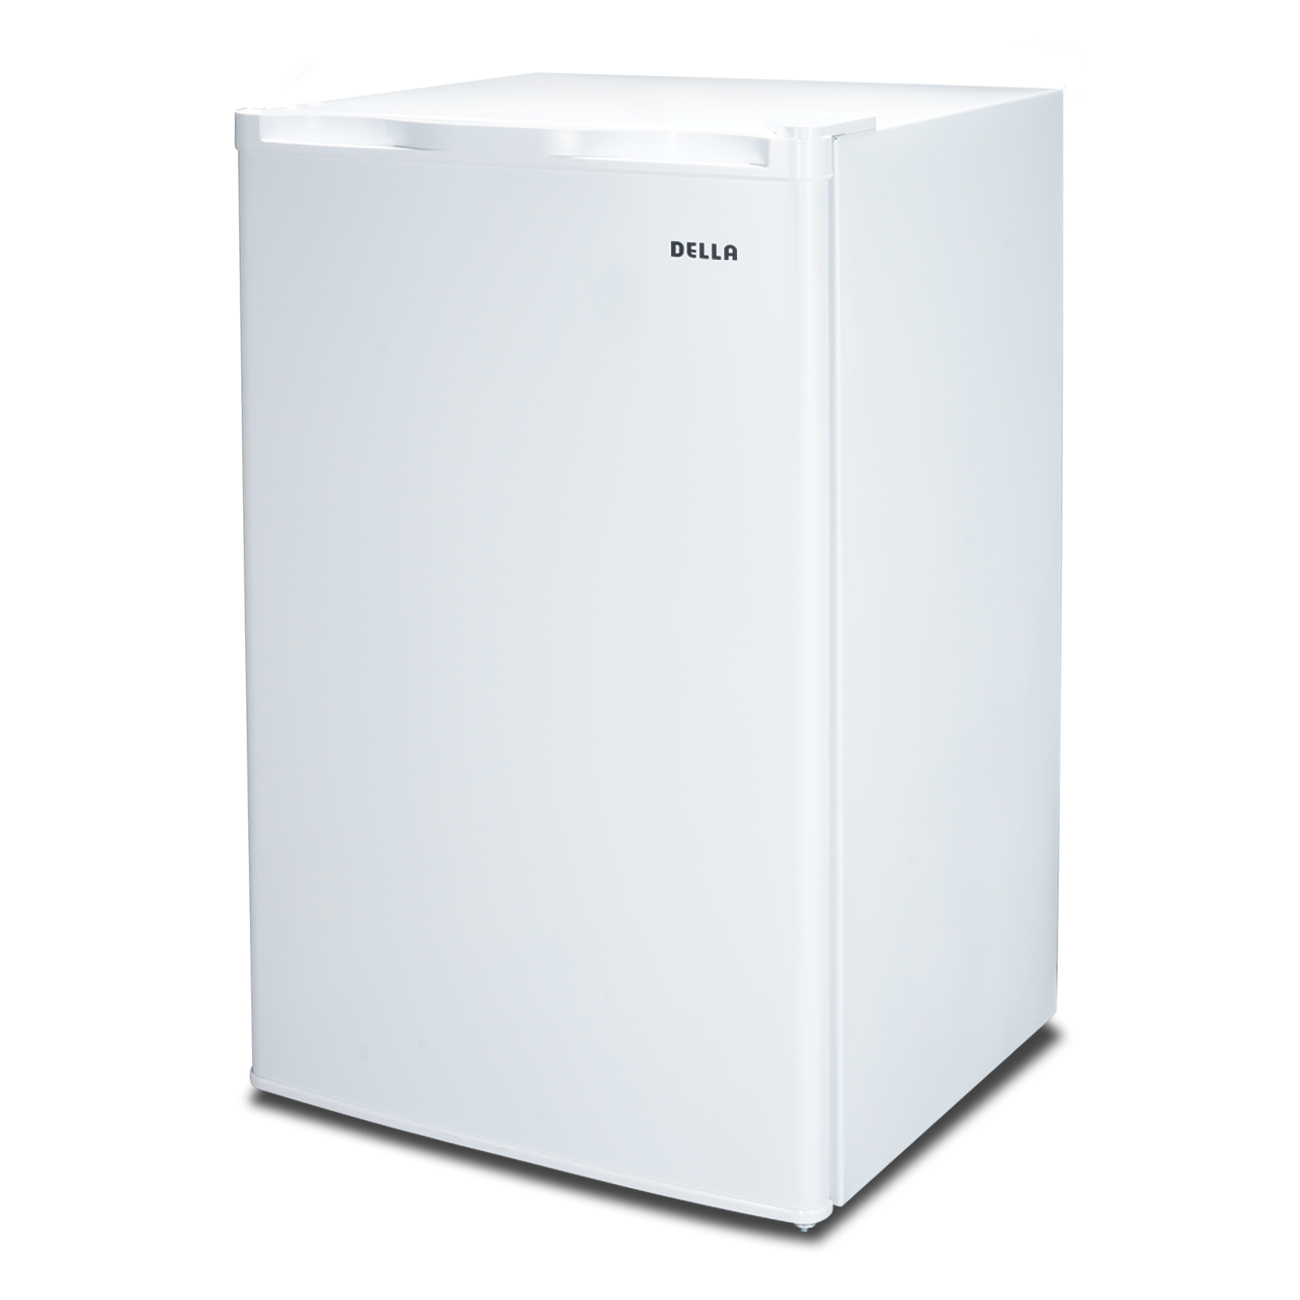 compact refrigerator mini freezer home office dorm fridge. Black Bedroom Furniture Sets. Home Design Ideas